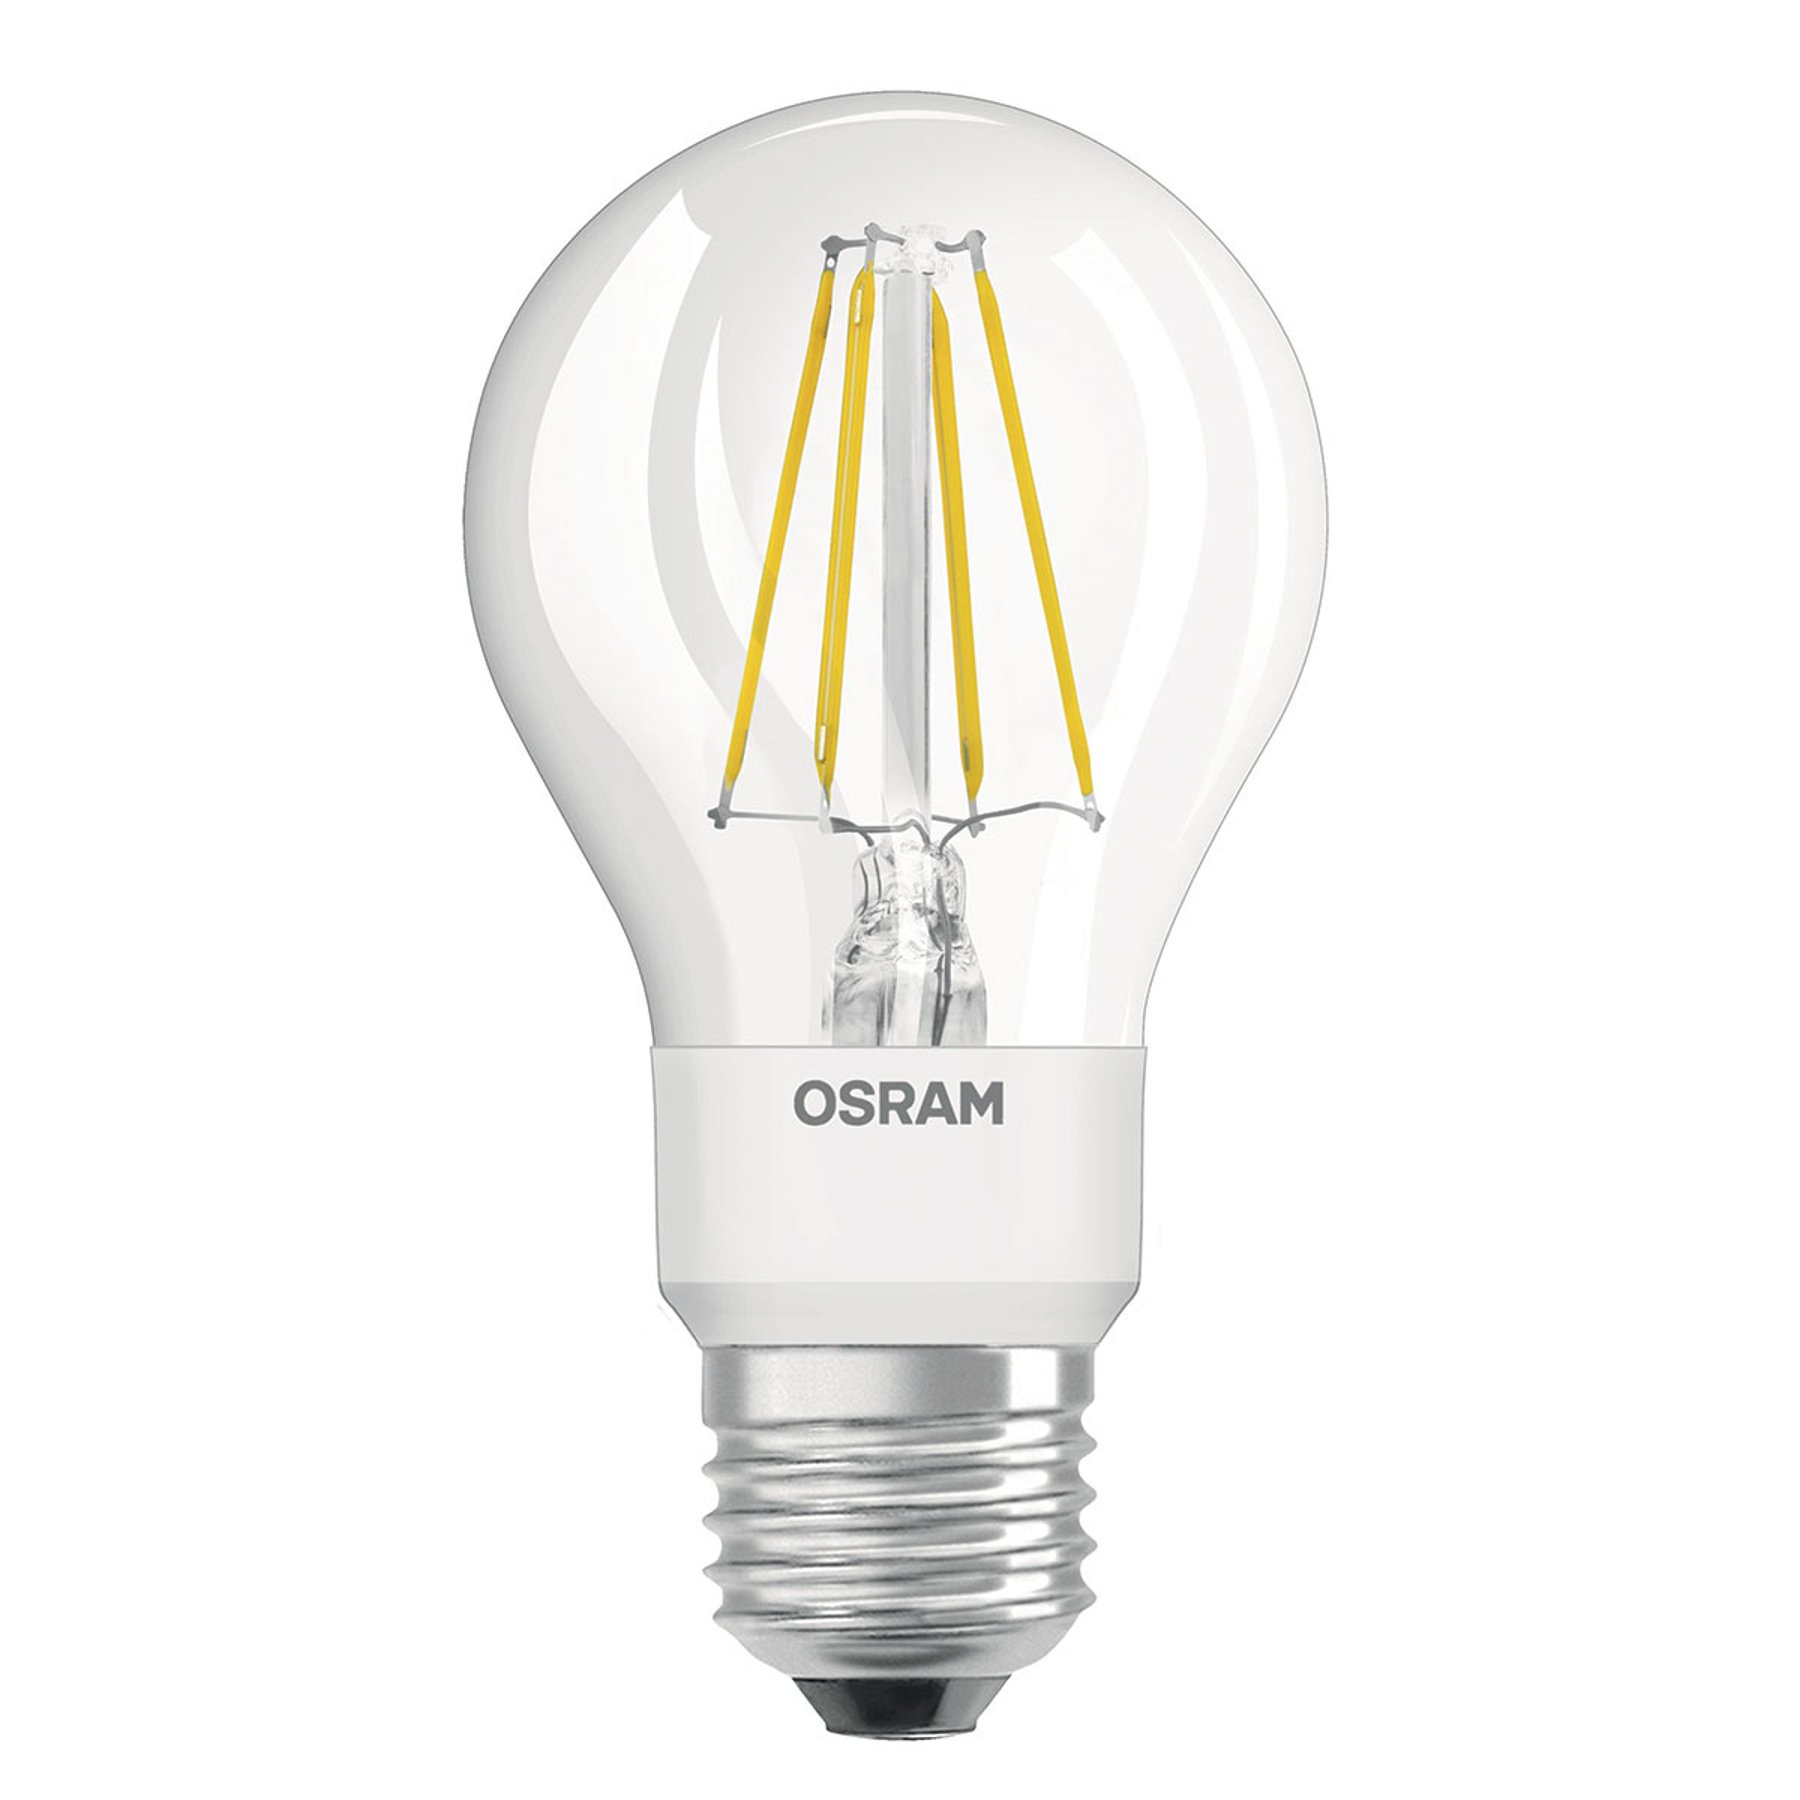 OSRAM LED-pære 4,5W Star+ GLOWdim filament klar